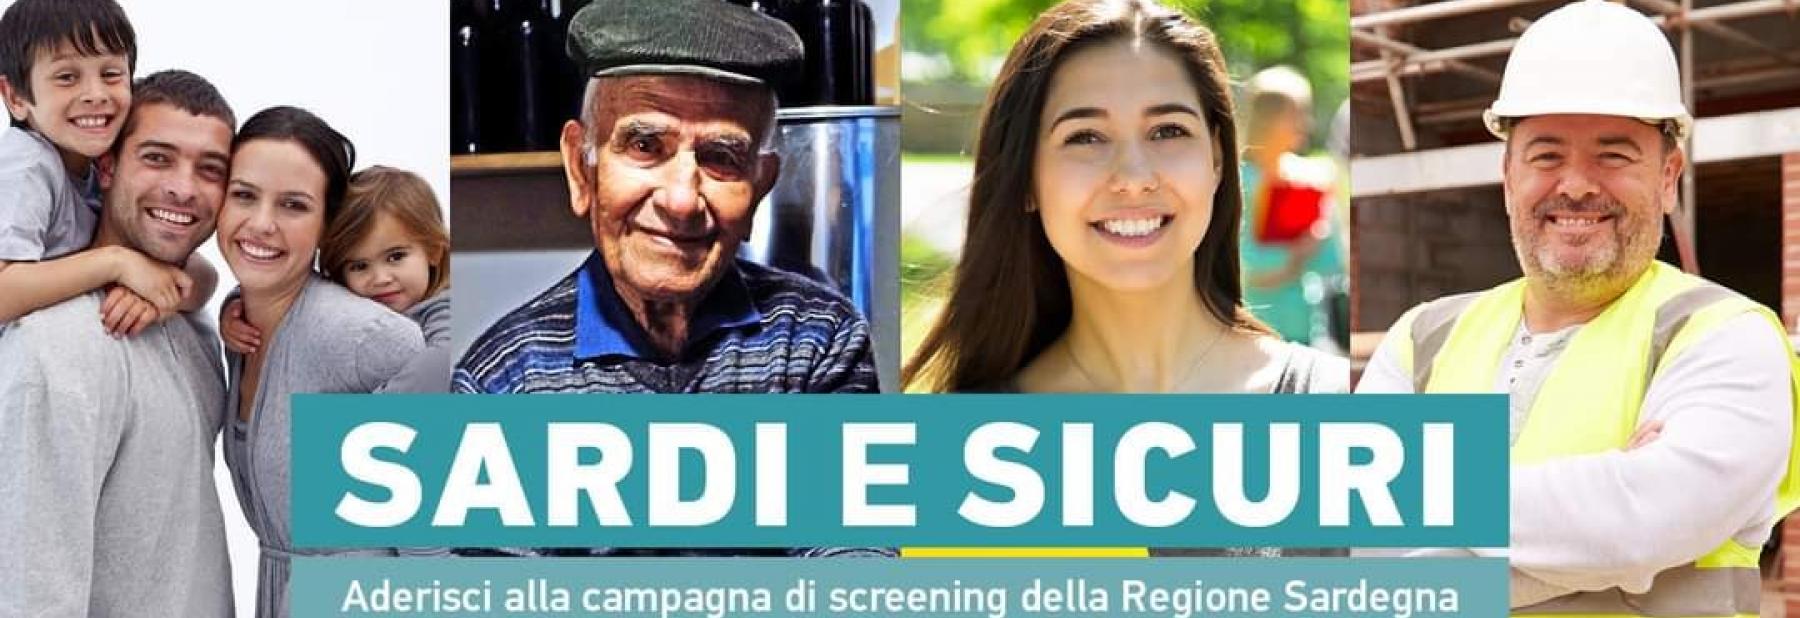 sardi_e_sicuri